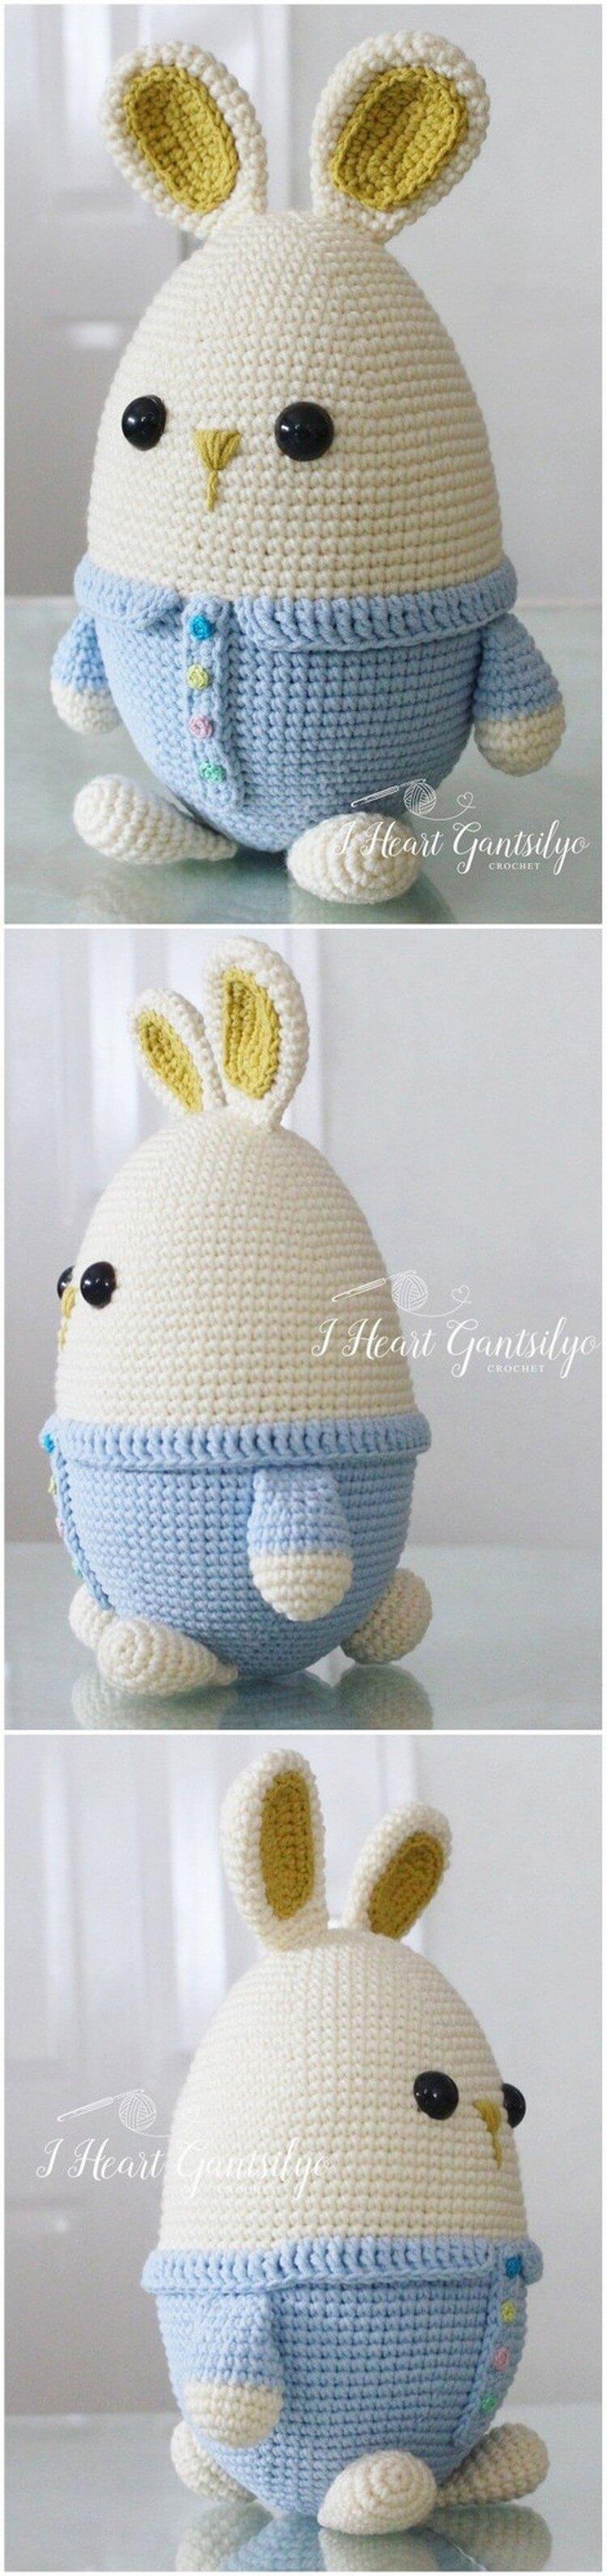 Crochet Amigurumi Pattern (90)